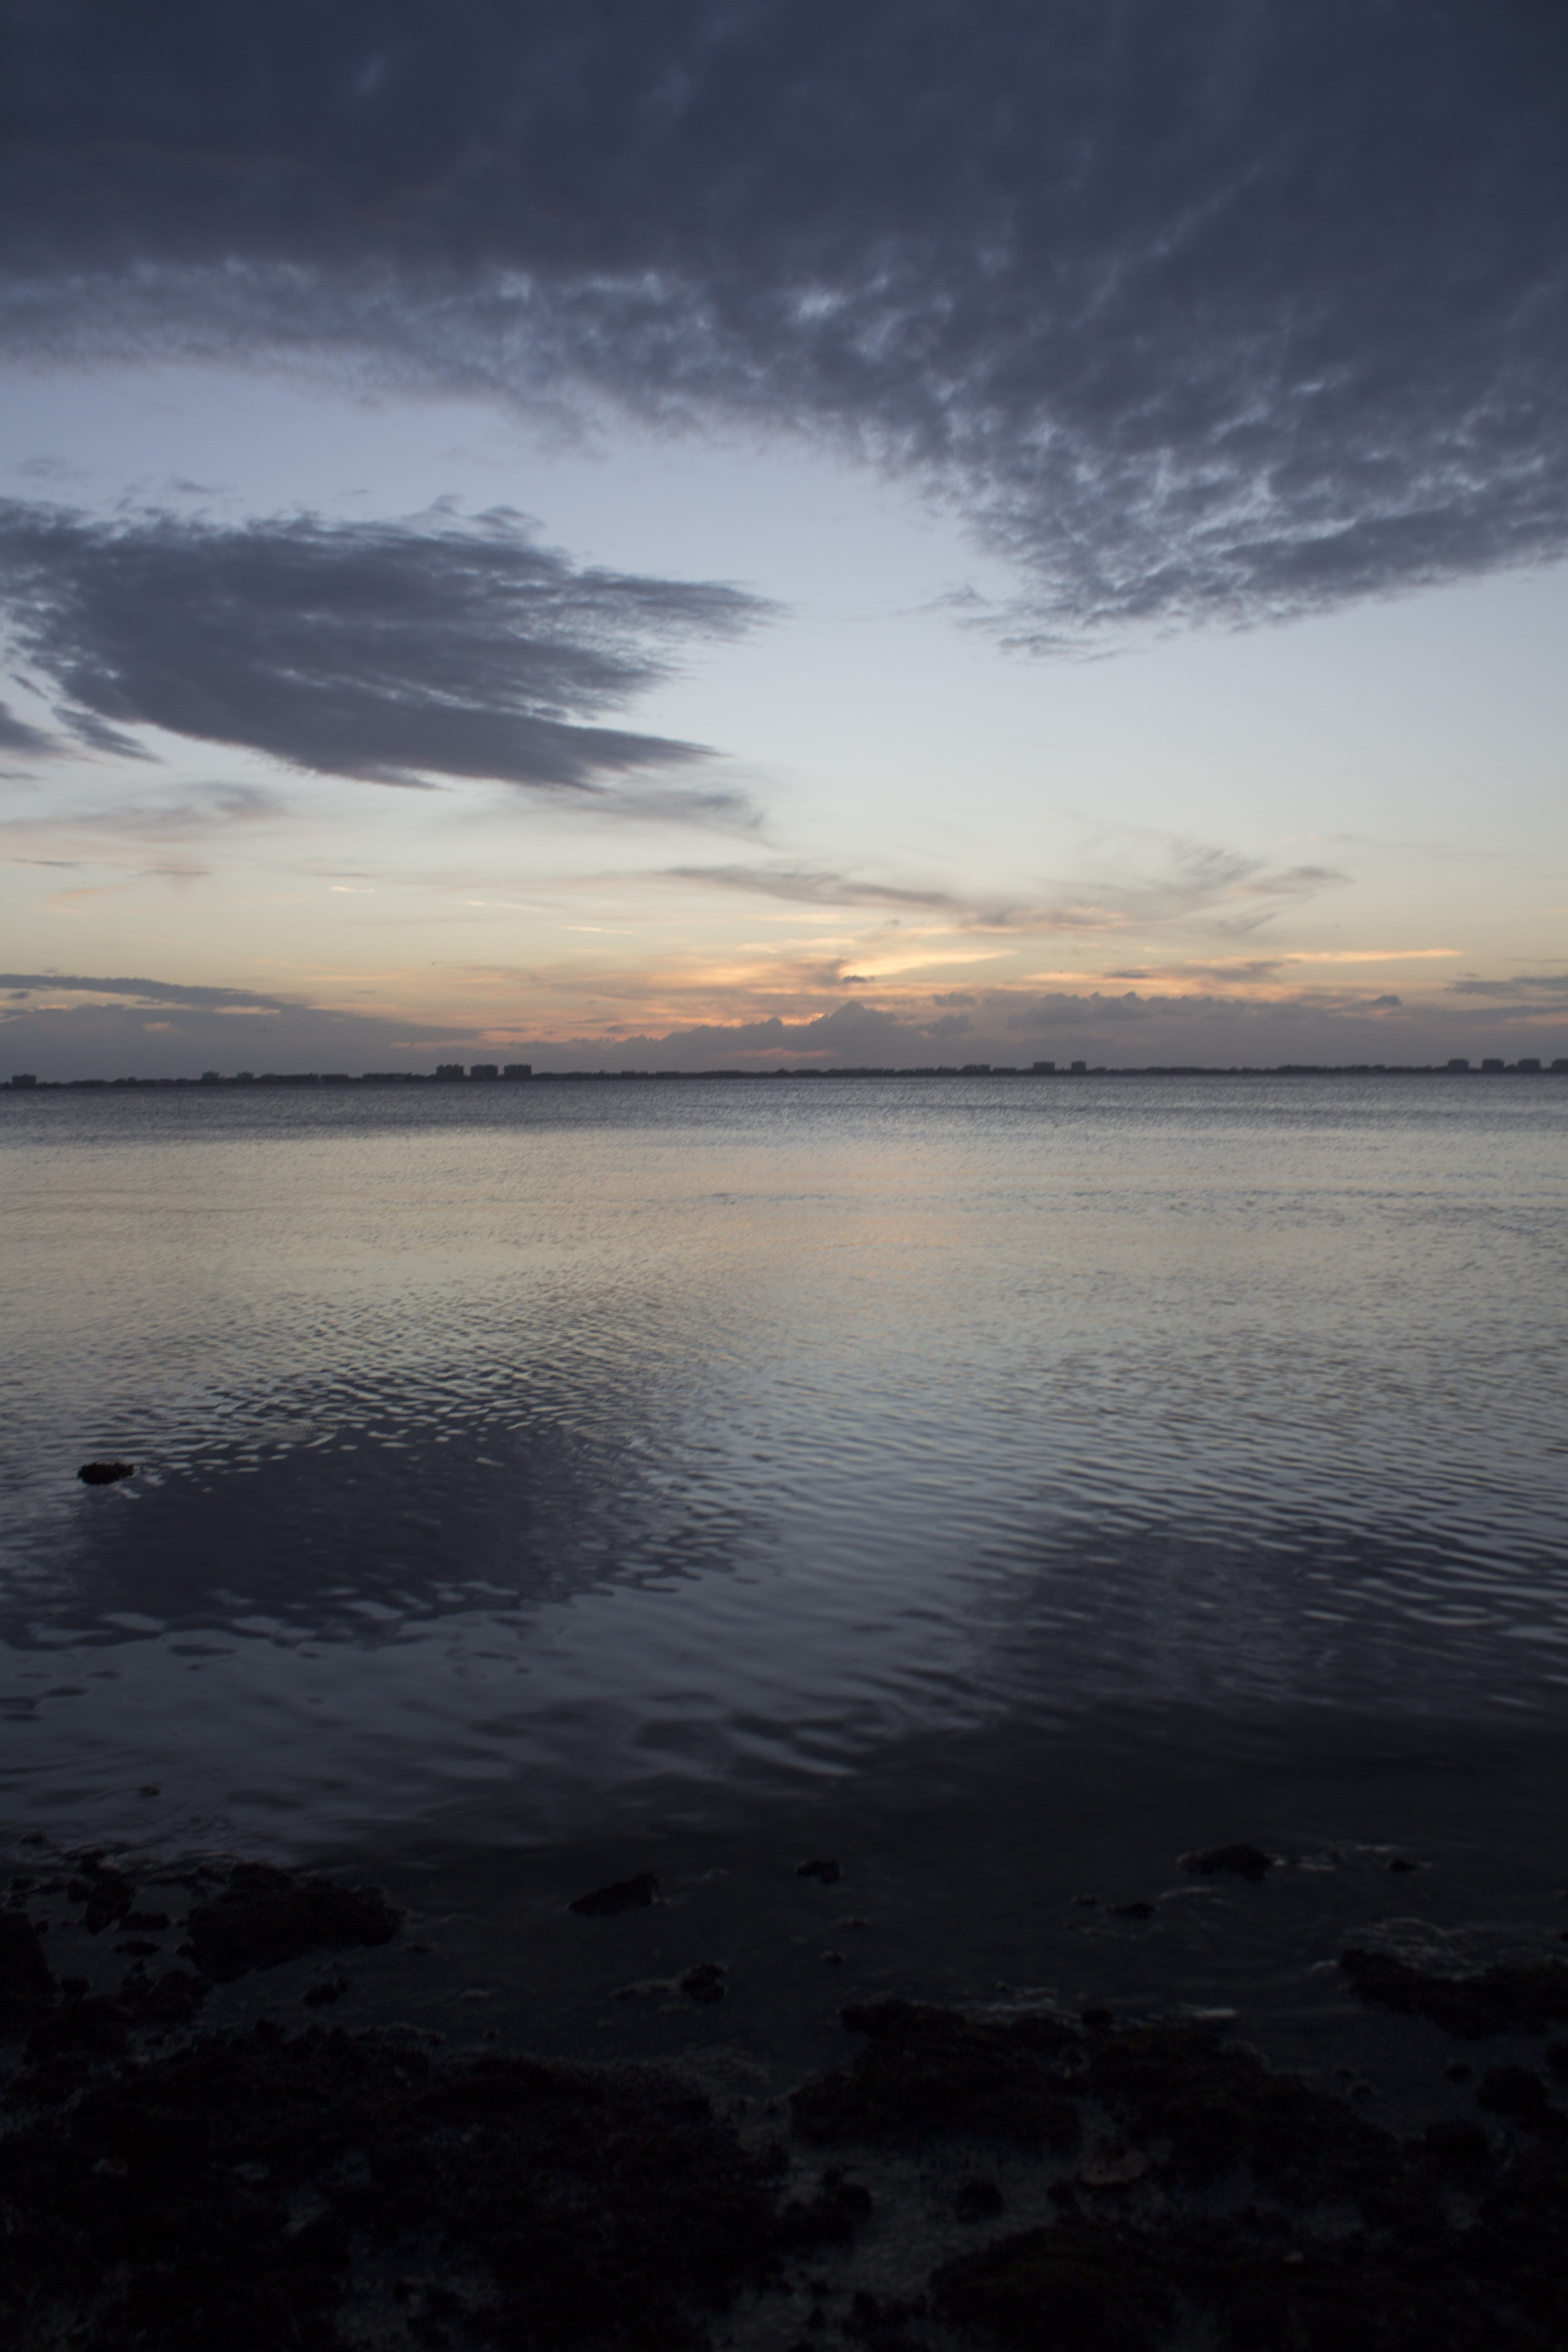 Kostenloses Stock Foto zu #sunset #water #gorgeous #clouds #weather #florida